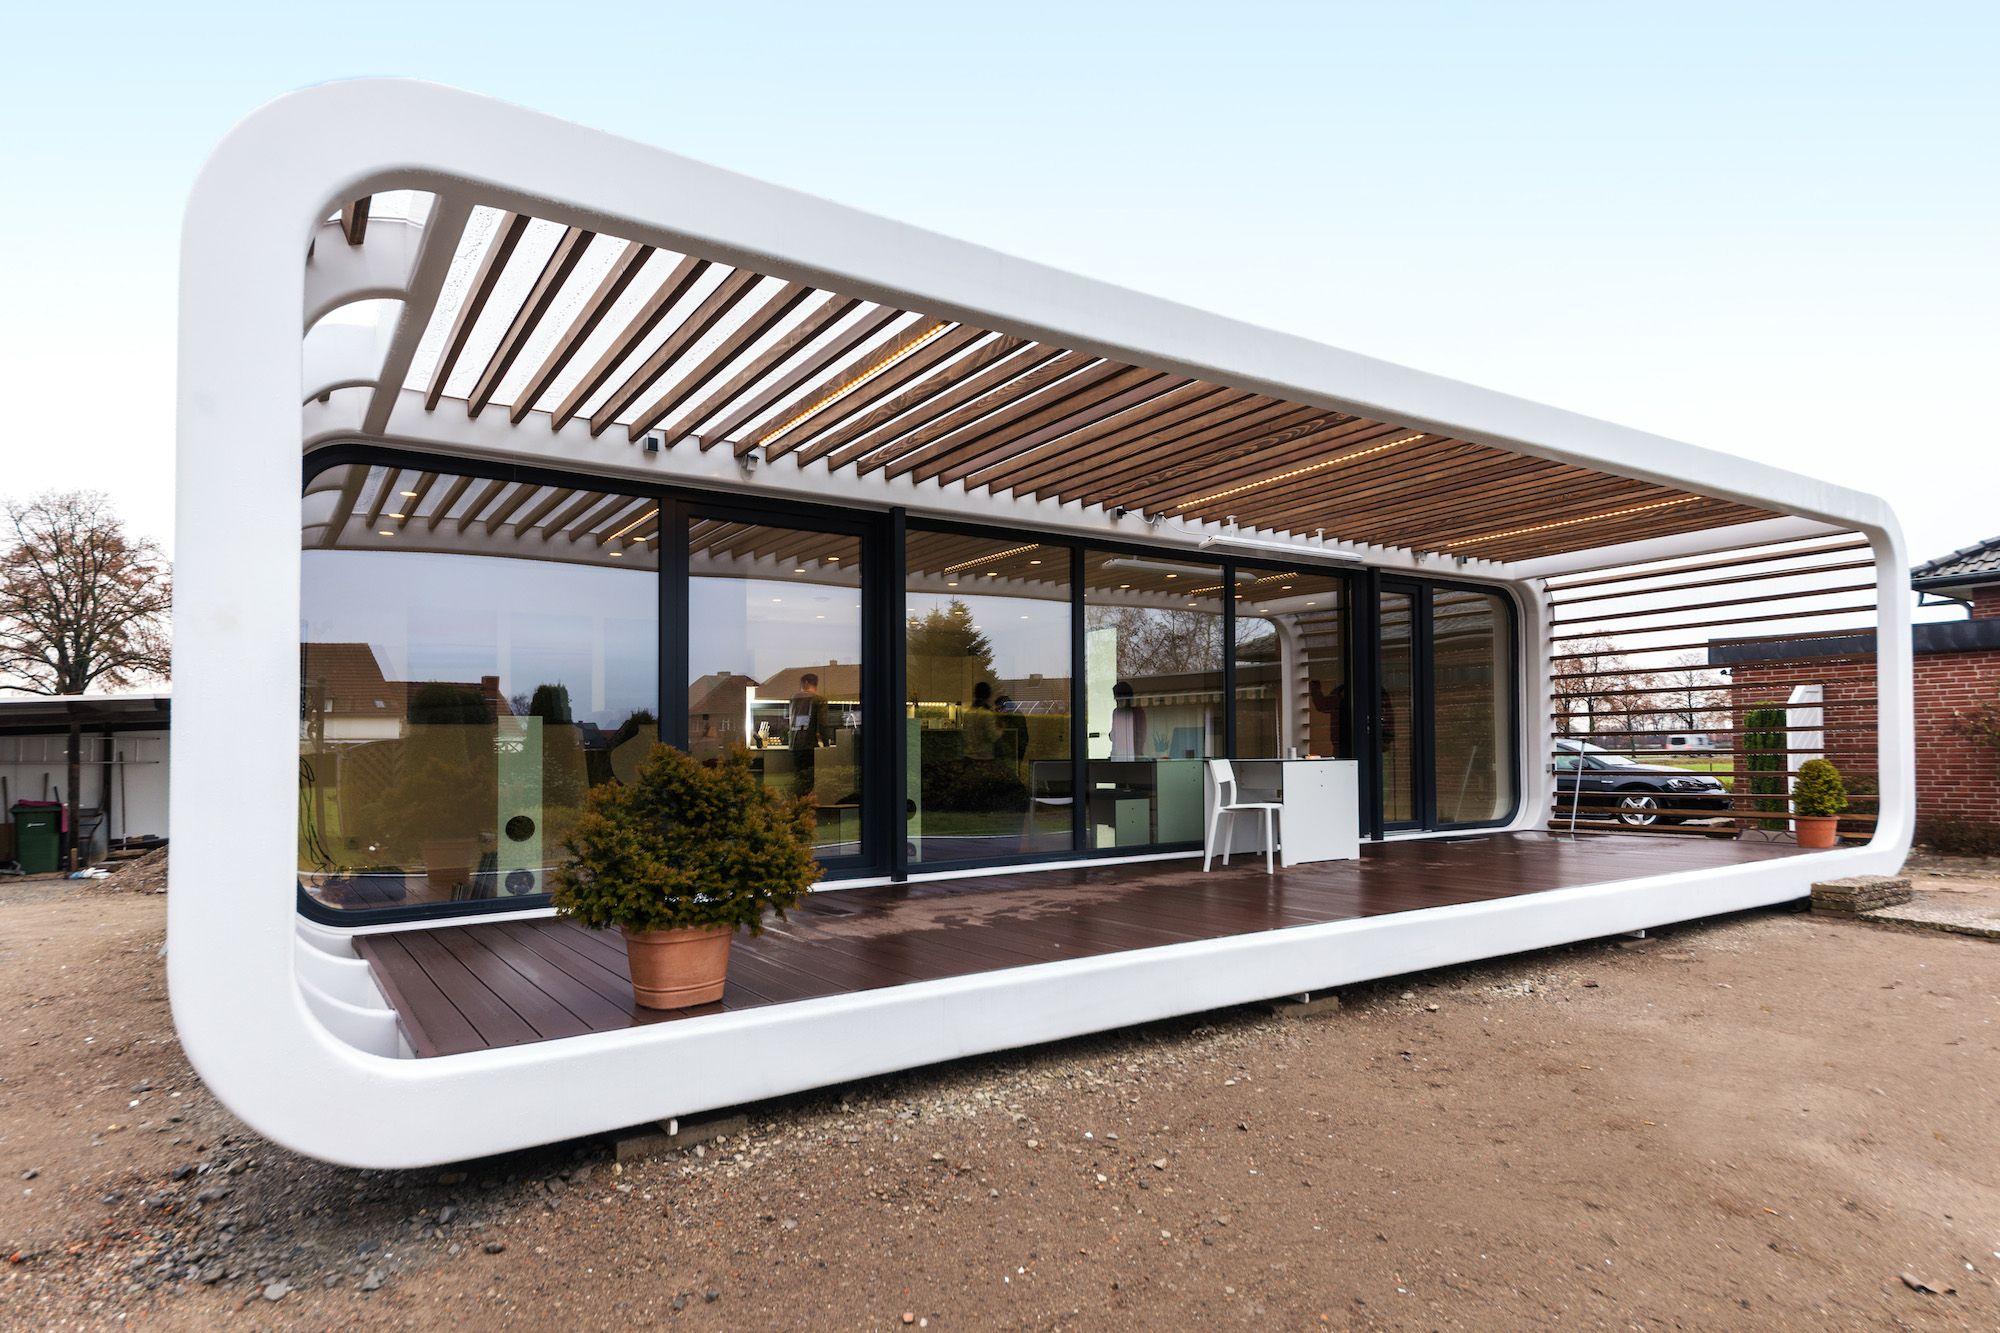 Fantastisch 5 Cool Prefab Houses You Can Order Right Now    Curbedclockmenumore Arrownoyes : Prefabulous!